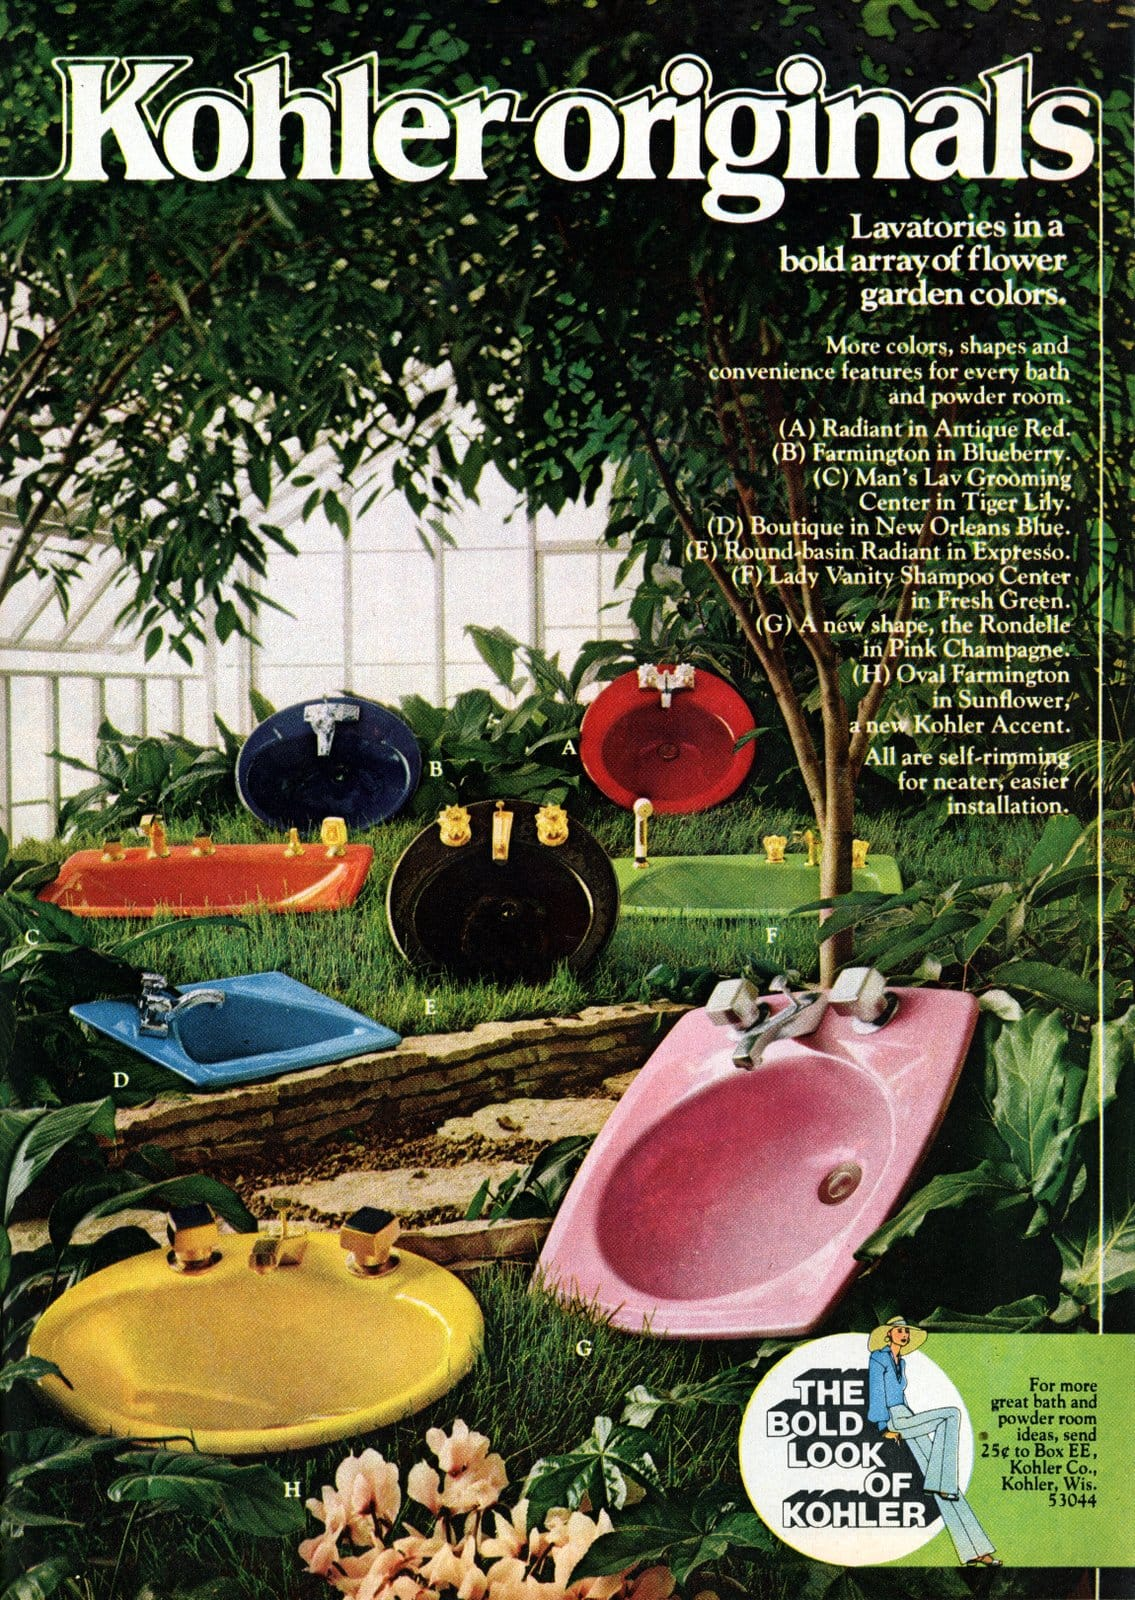 Kohler Originals Lavatories in a bold array of flower garden colors (1967)